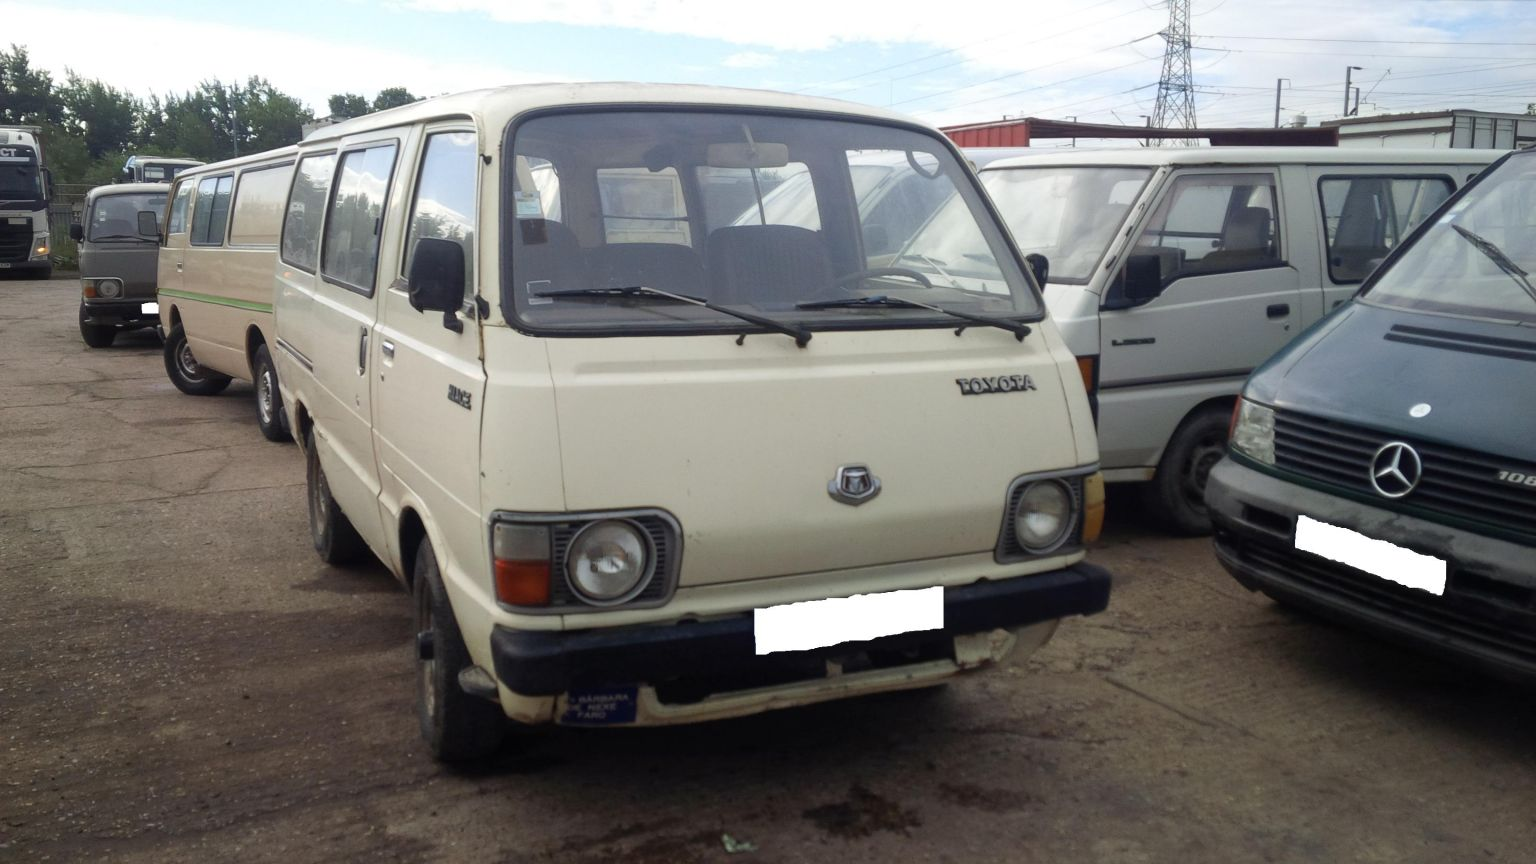 LHD Toyota Hiace